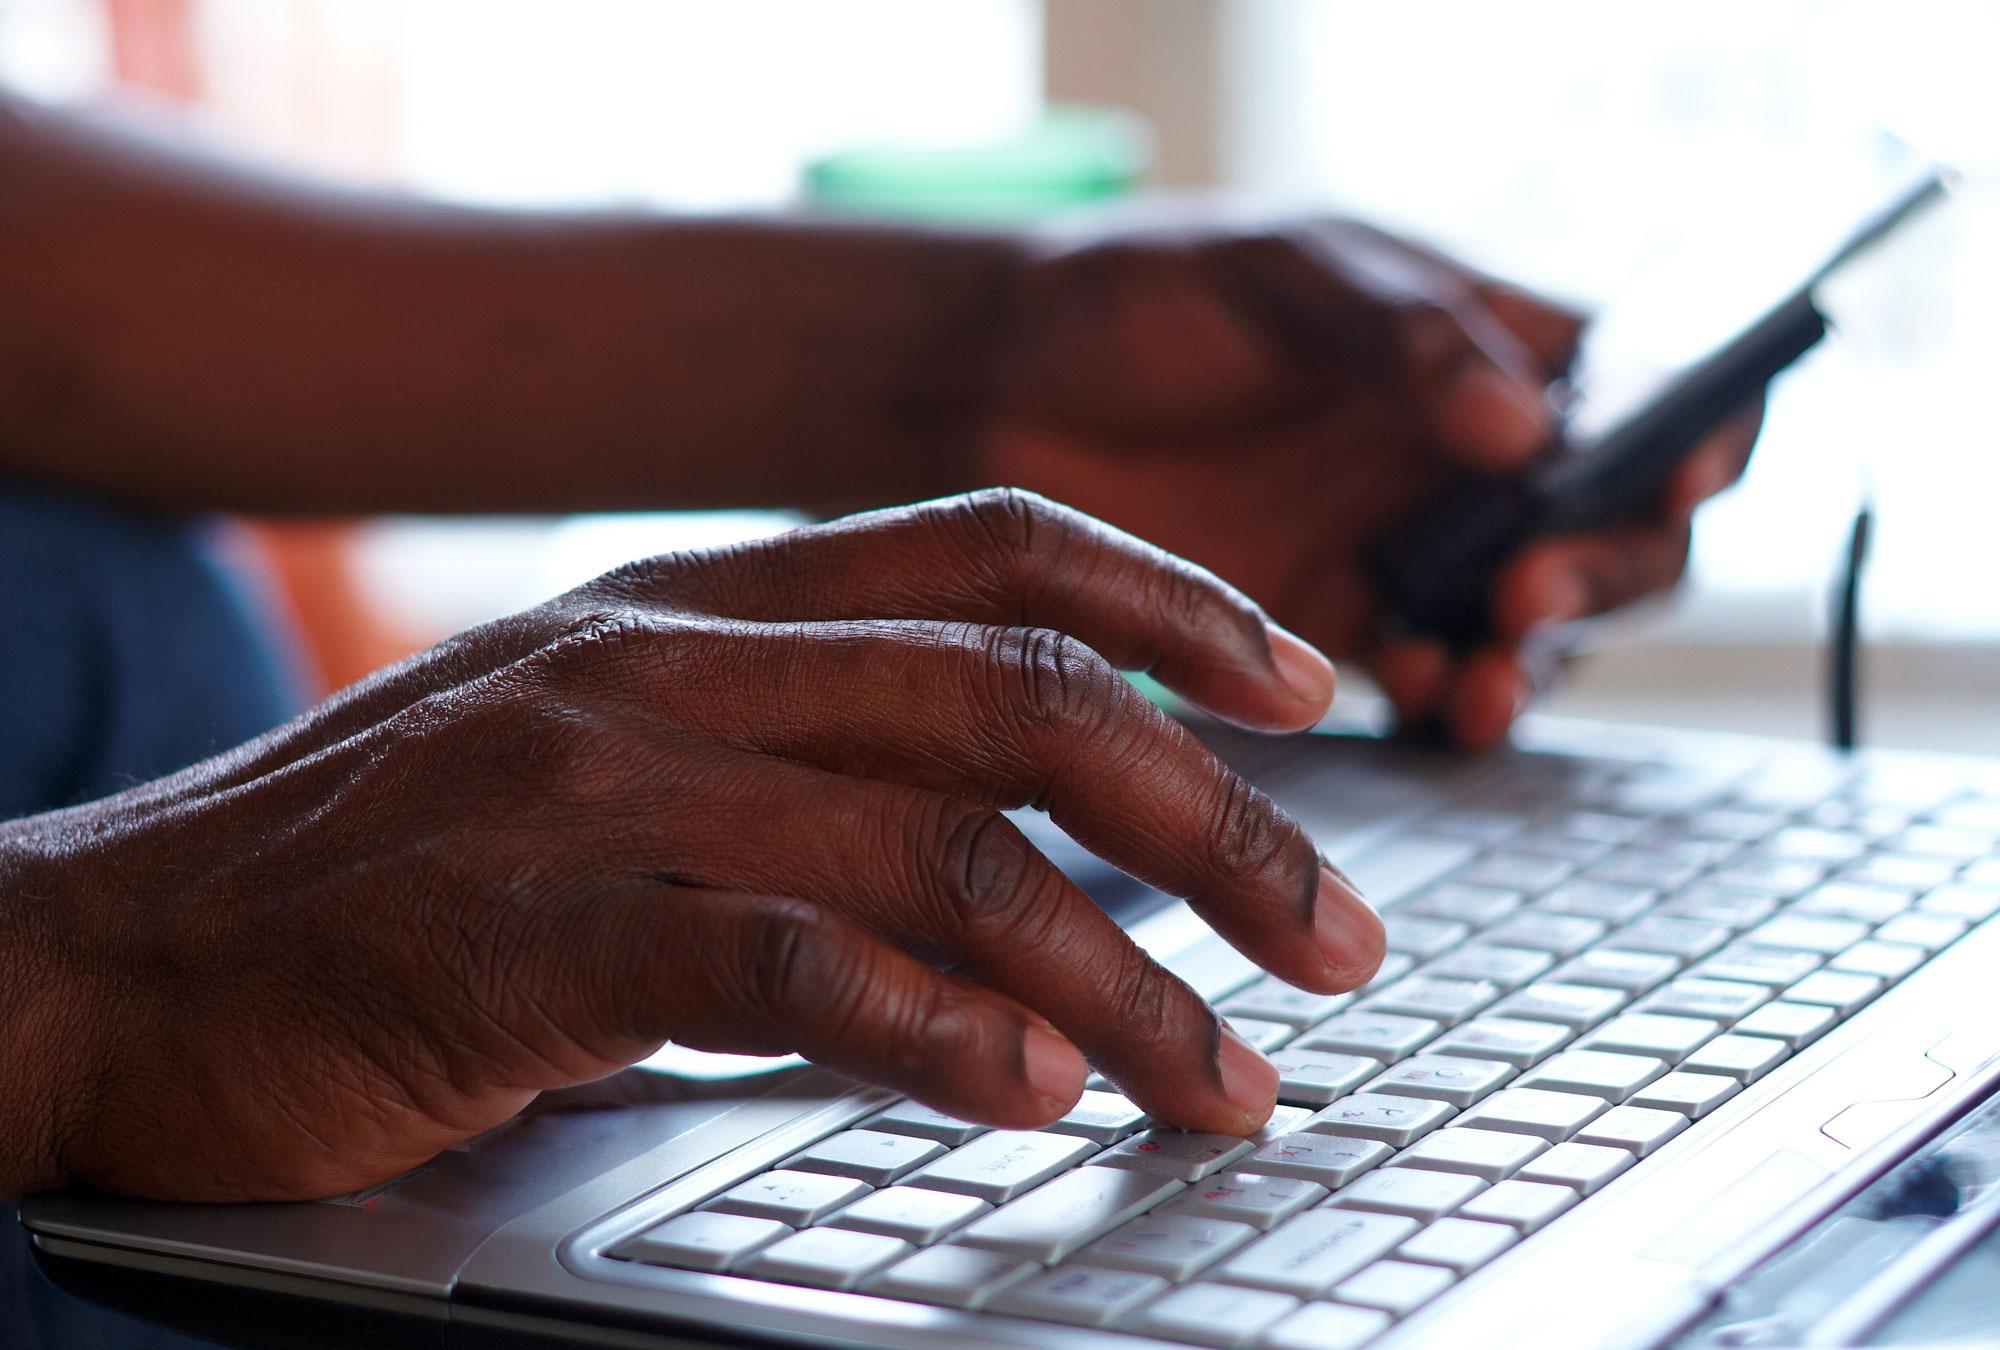 Hands type on keyboard